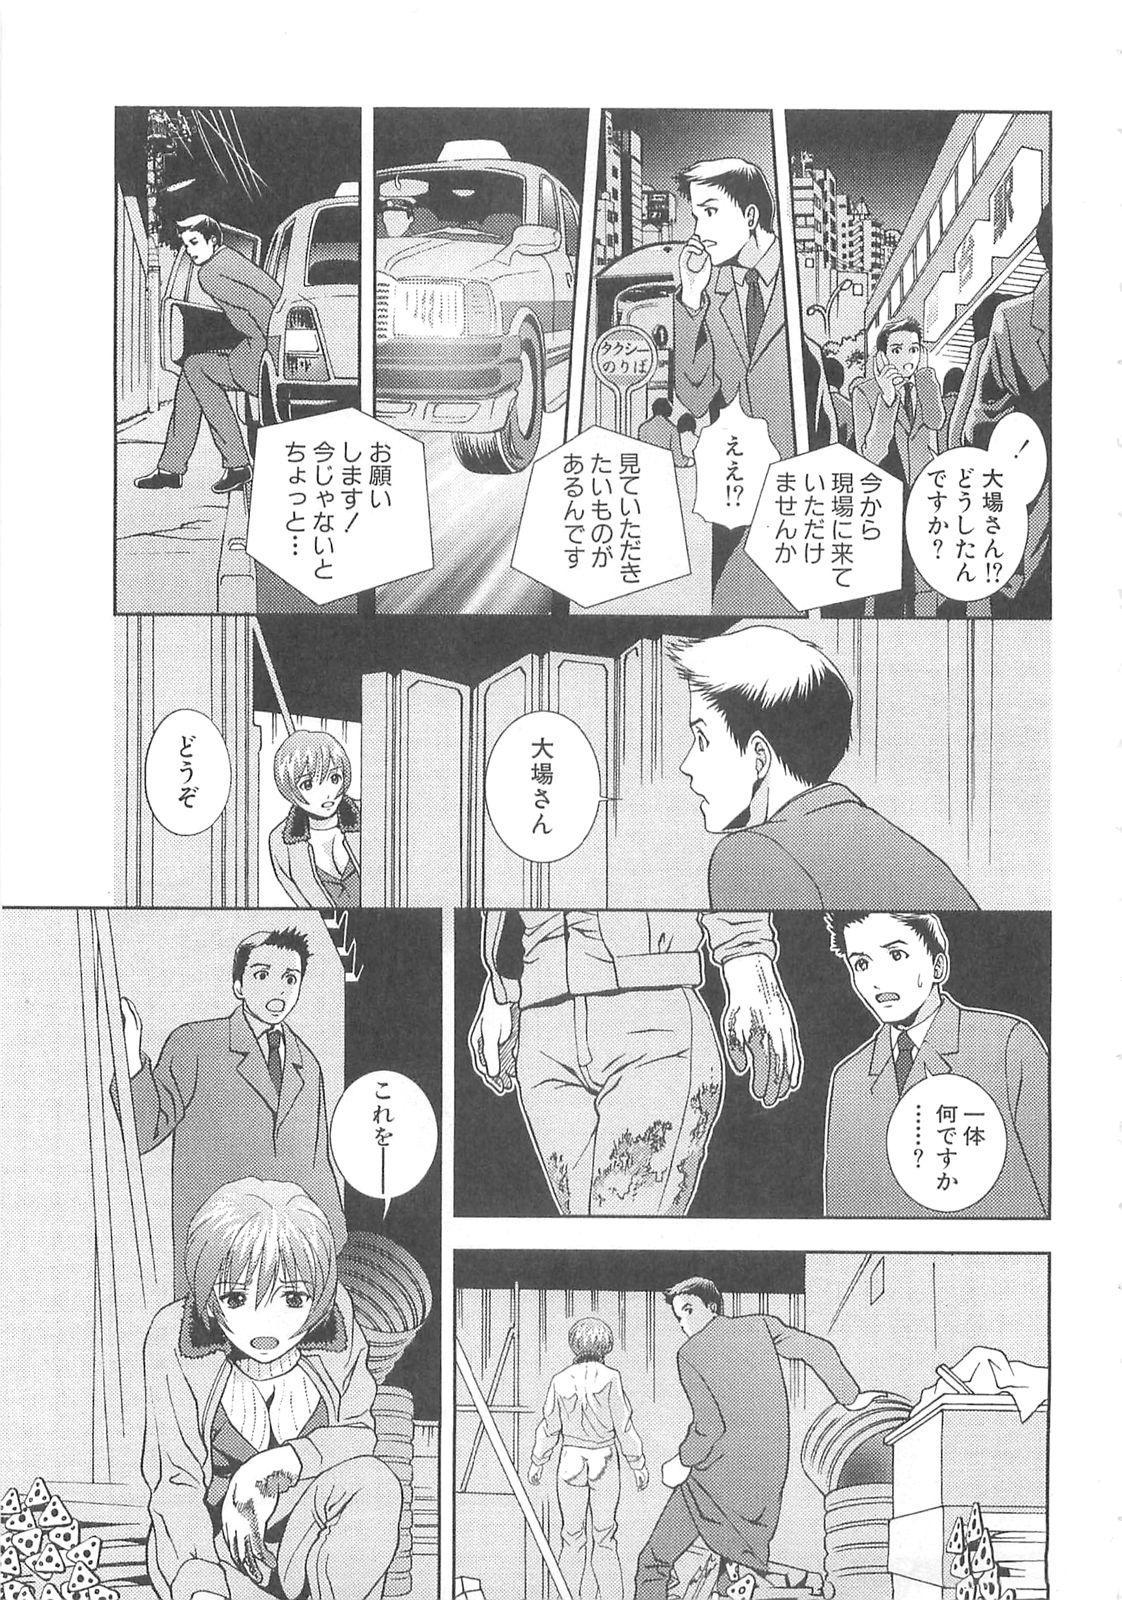 Tenshi no Kyuu - Angel's Pretty Hip 149